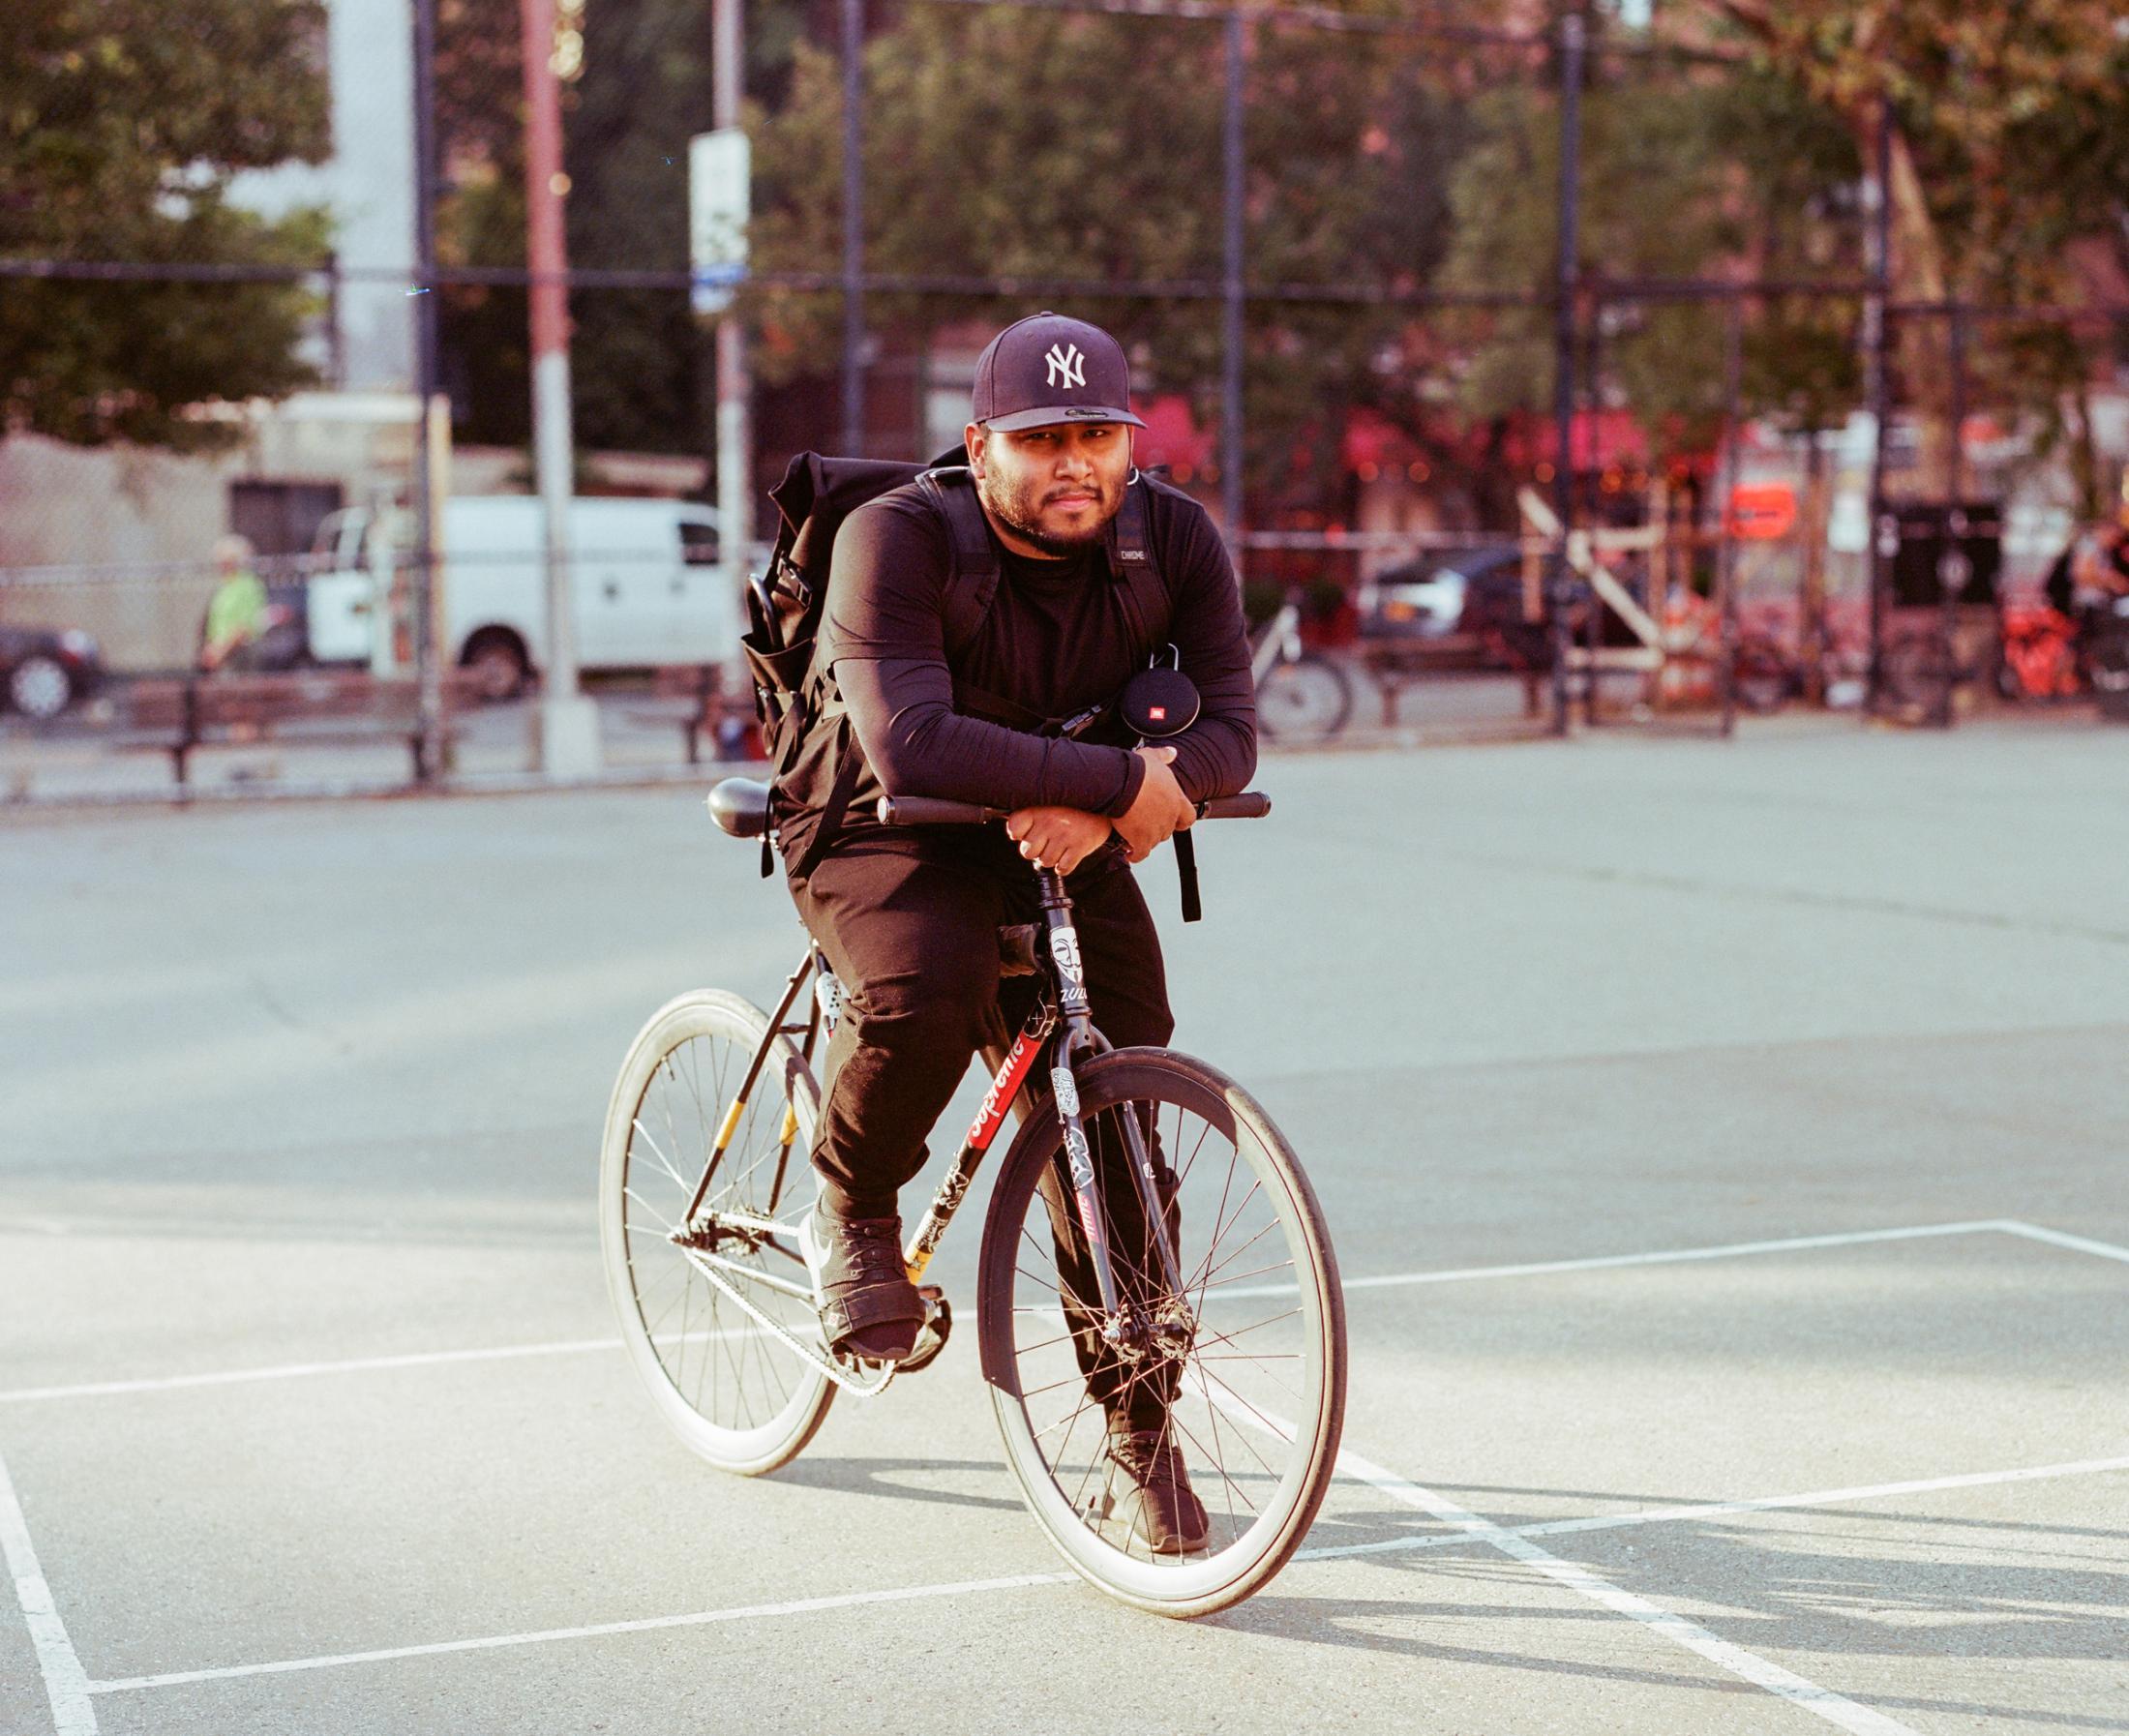 Jay (Jonathan Barahona) on September 27, 2019 in NYC. Photo essay on Bike Messengers.